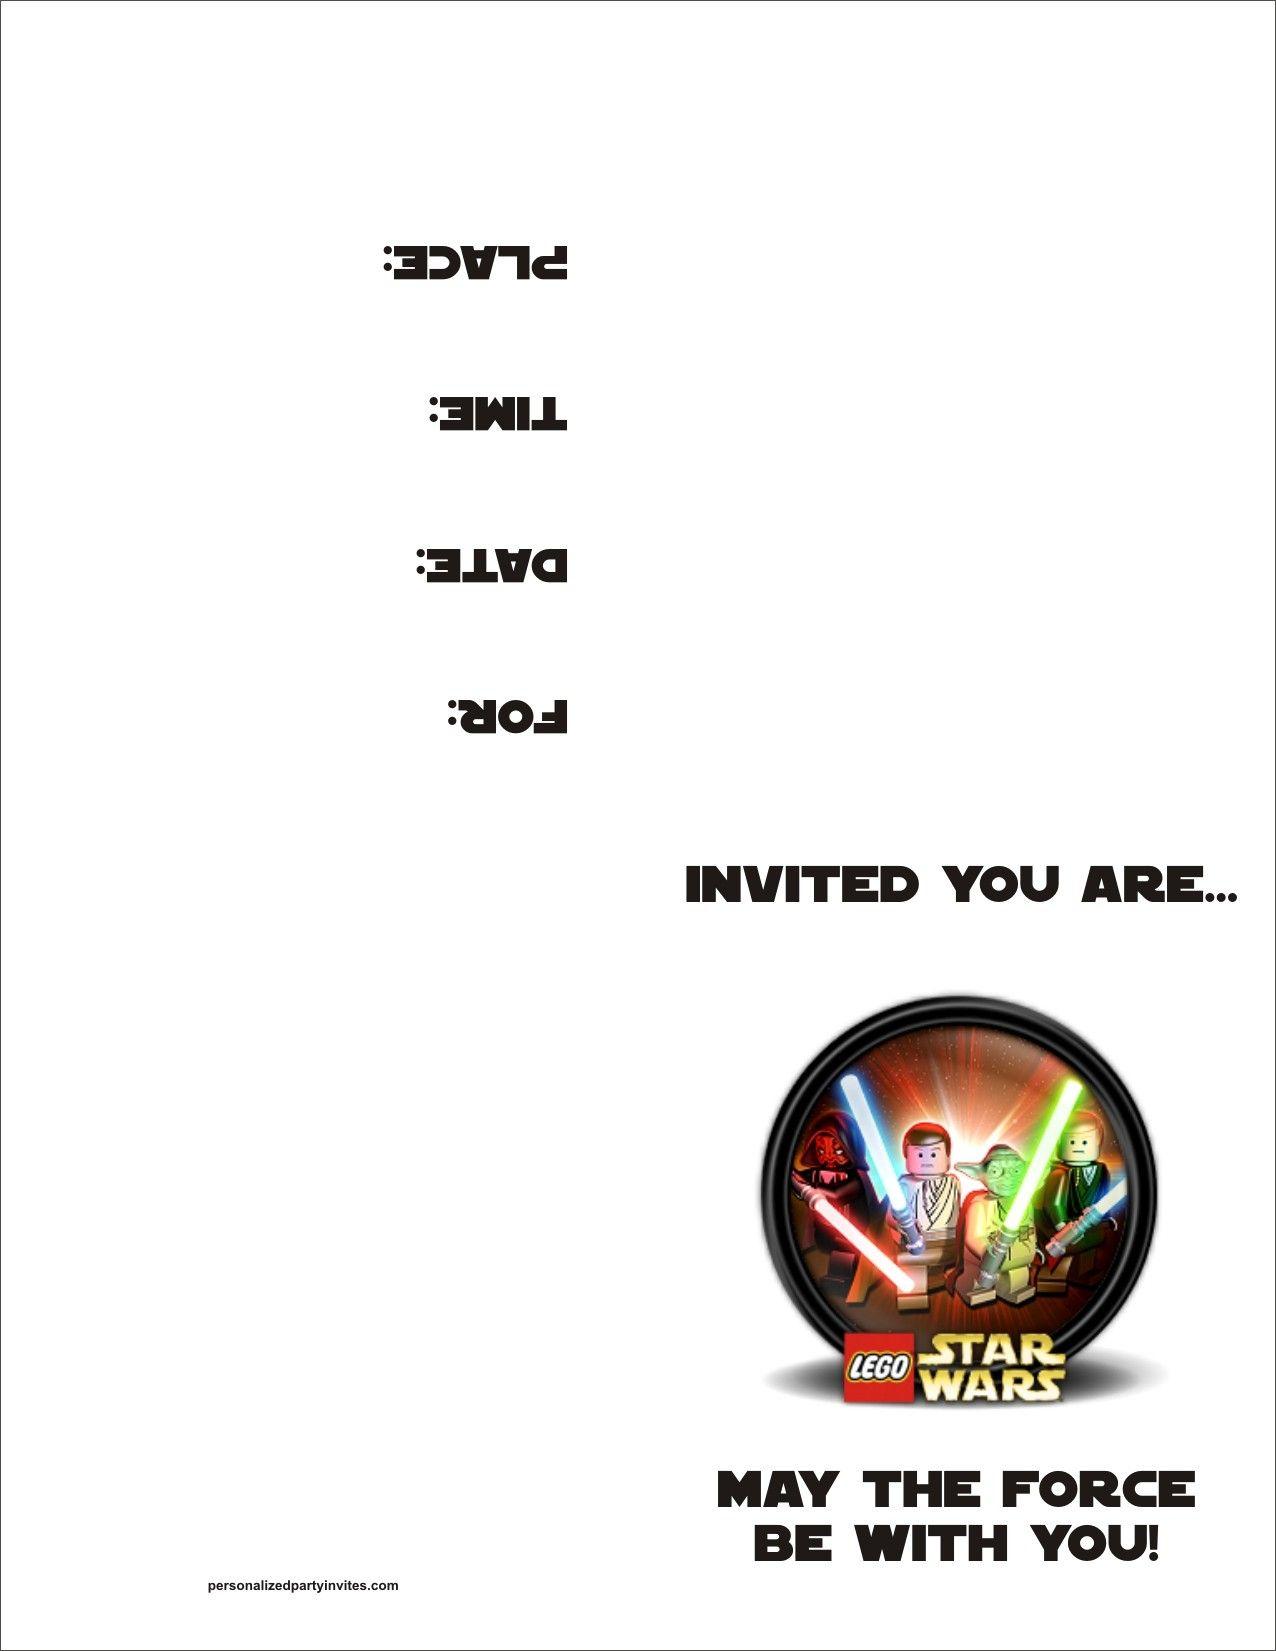 Lego Star Wars Free Printable Birthday Party Invitation. Doing This - Star Wars Invitations Free Printable